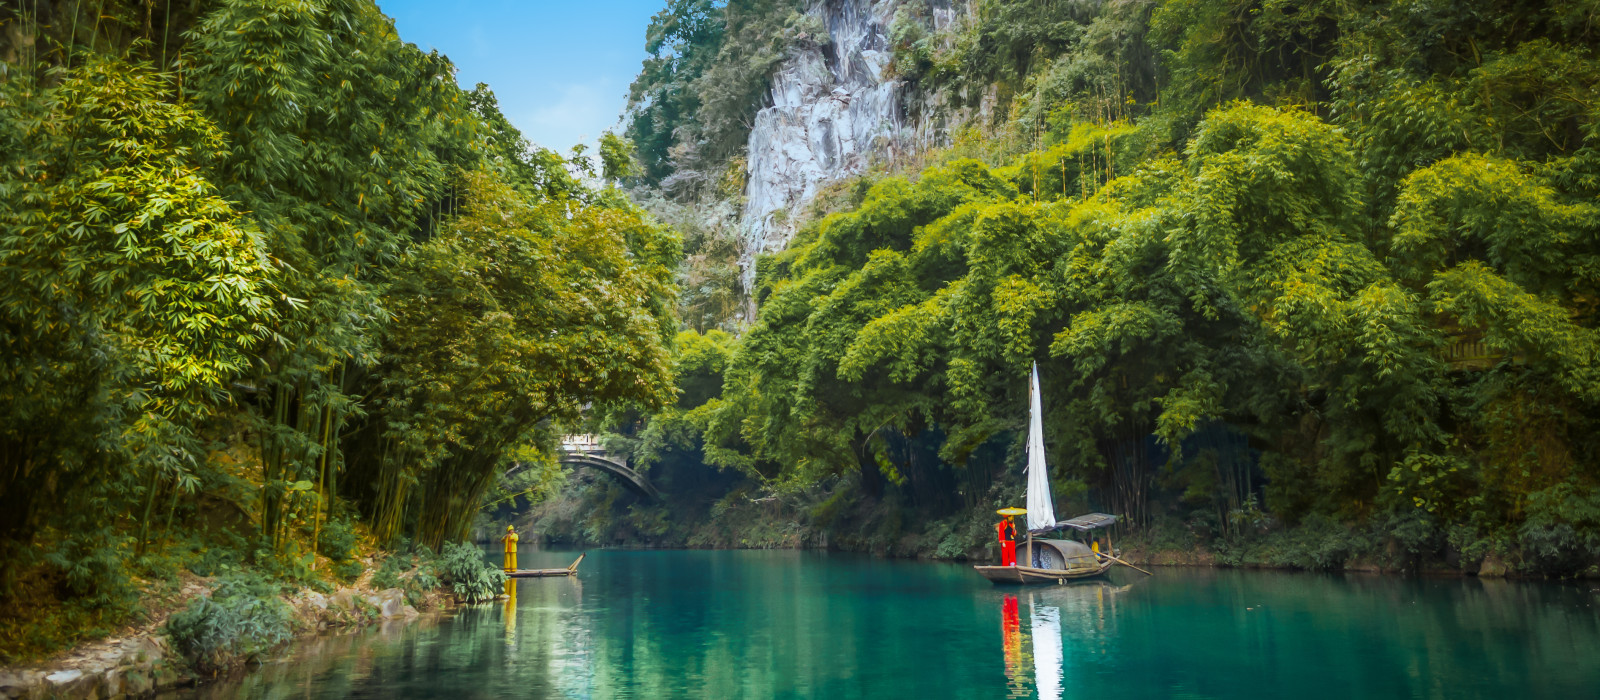 Imperial Cities, Tibet & Yangtze River Cruise Tour Trip 1